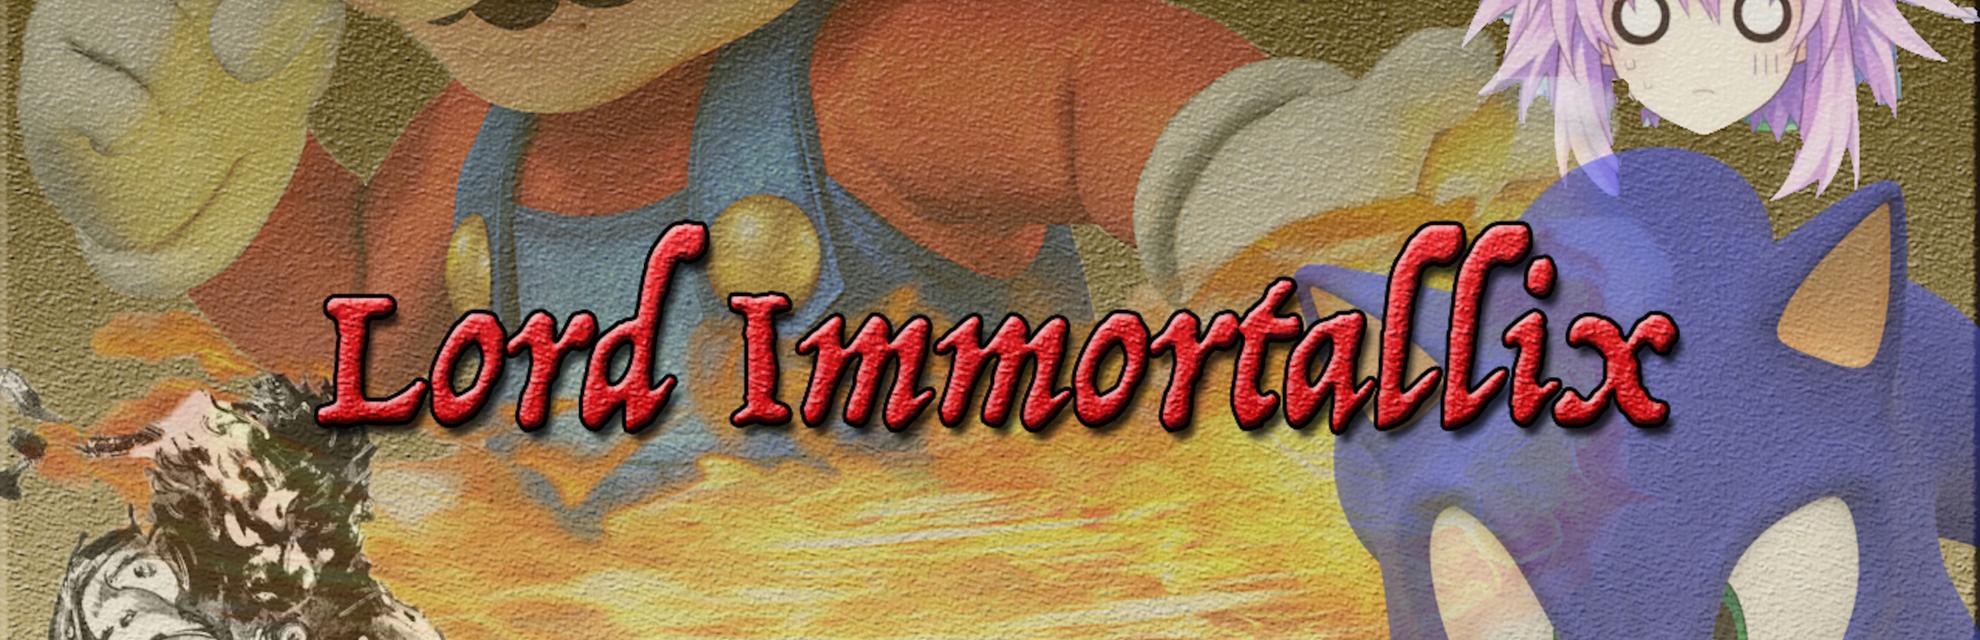 Immortallix blog header photo